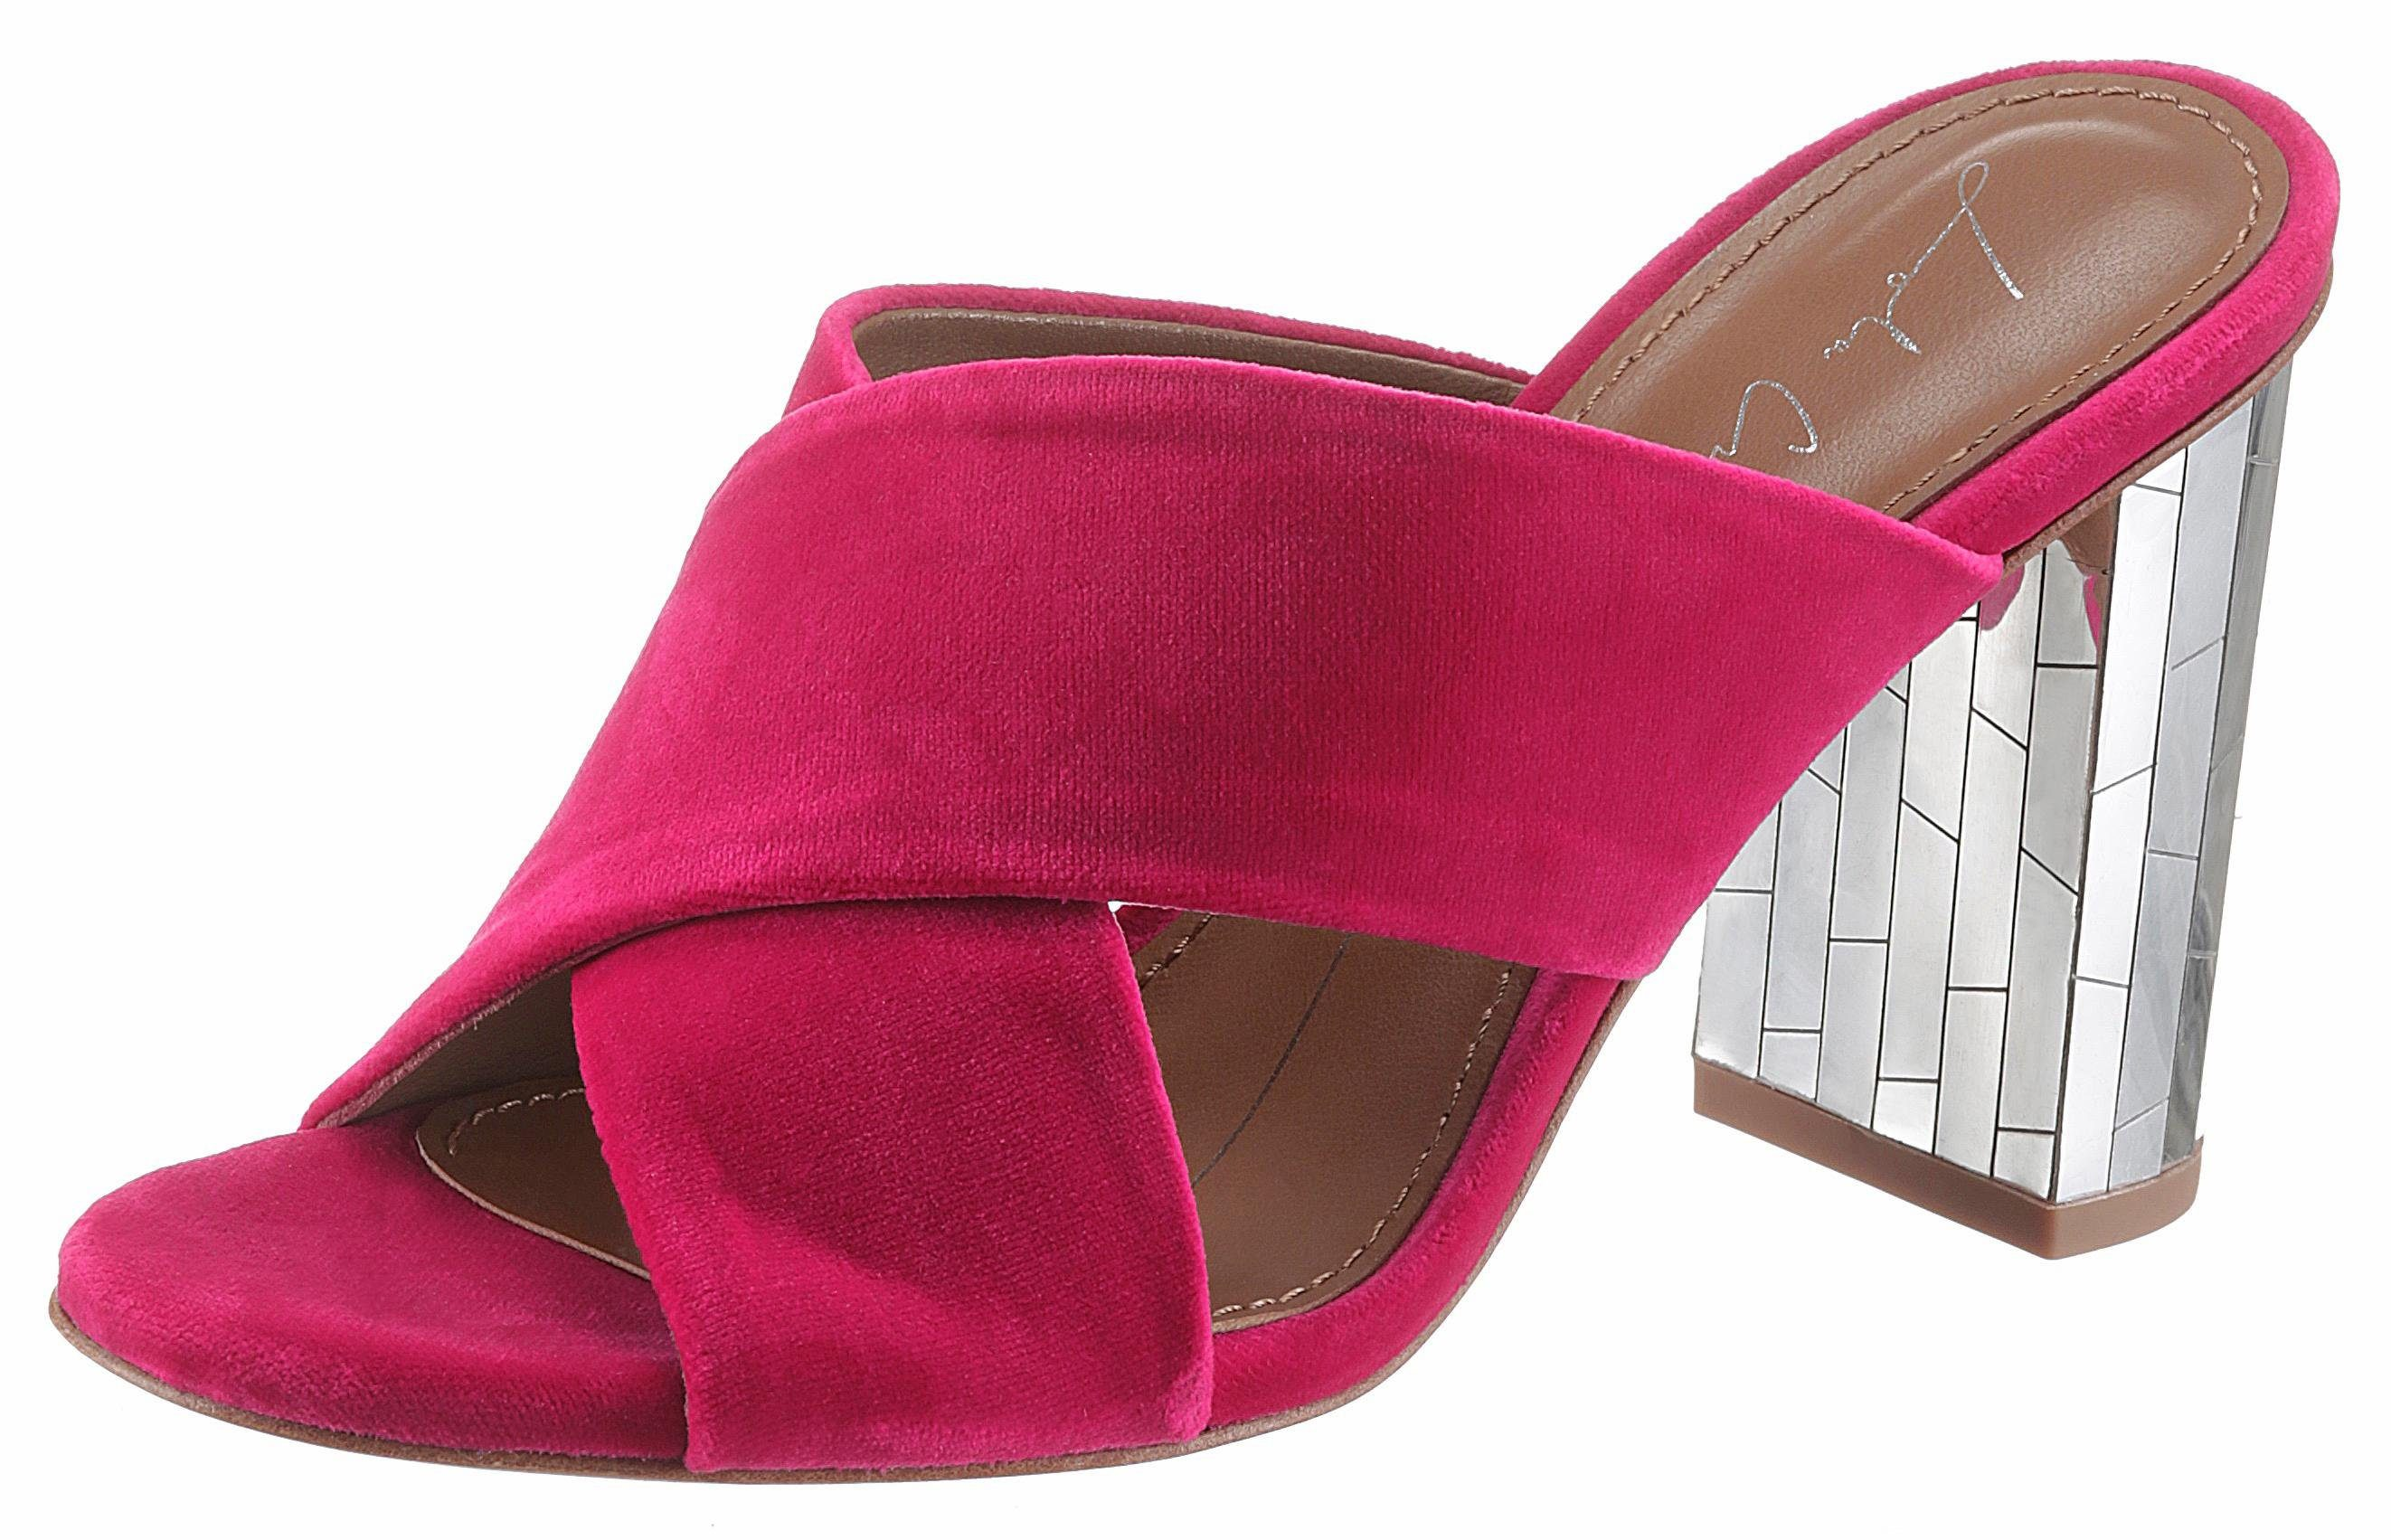 Lola Cruz Pantolette, mit Absatz in Spiegel-Optik  pink